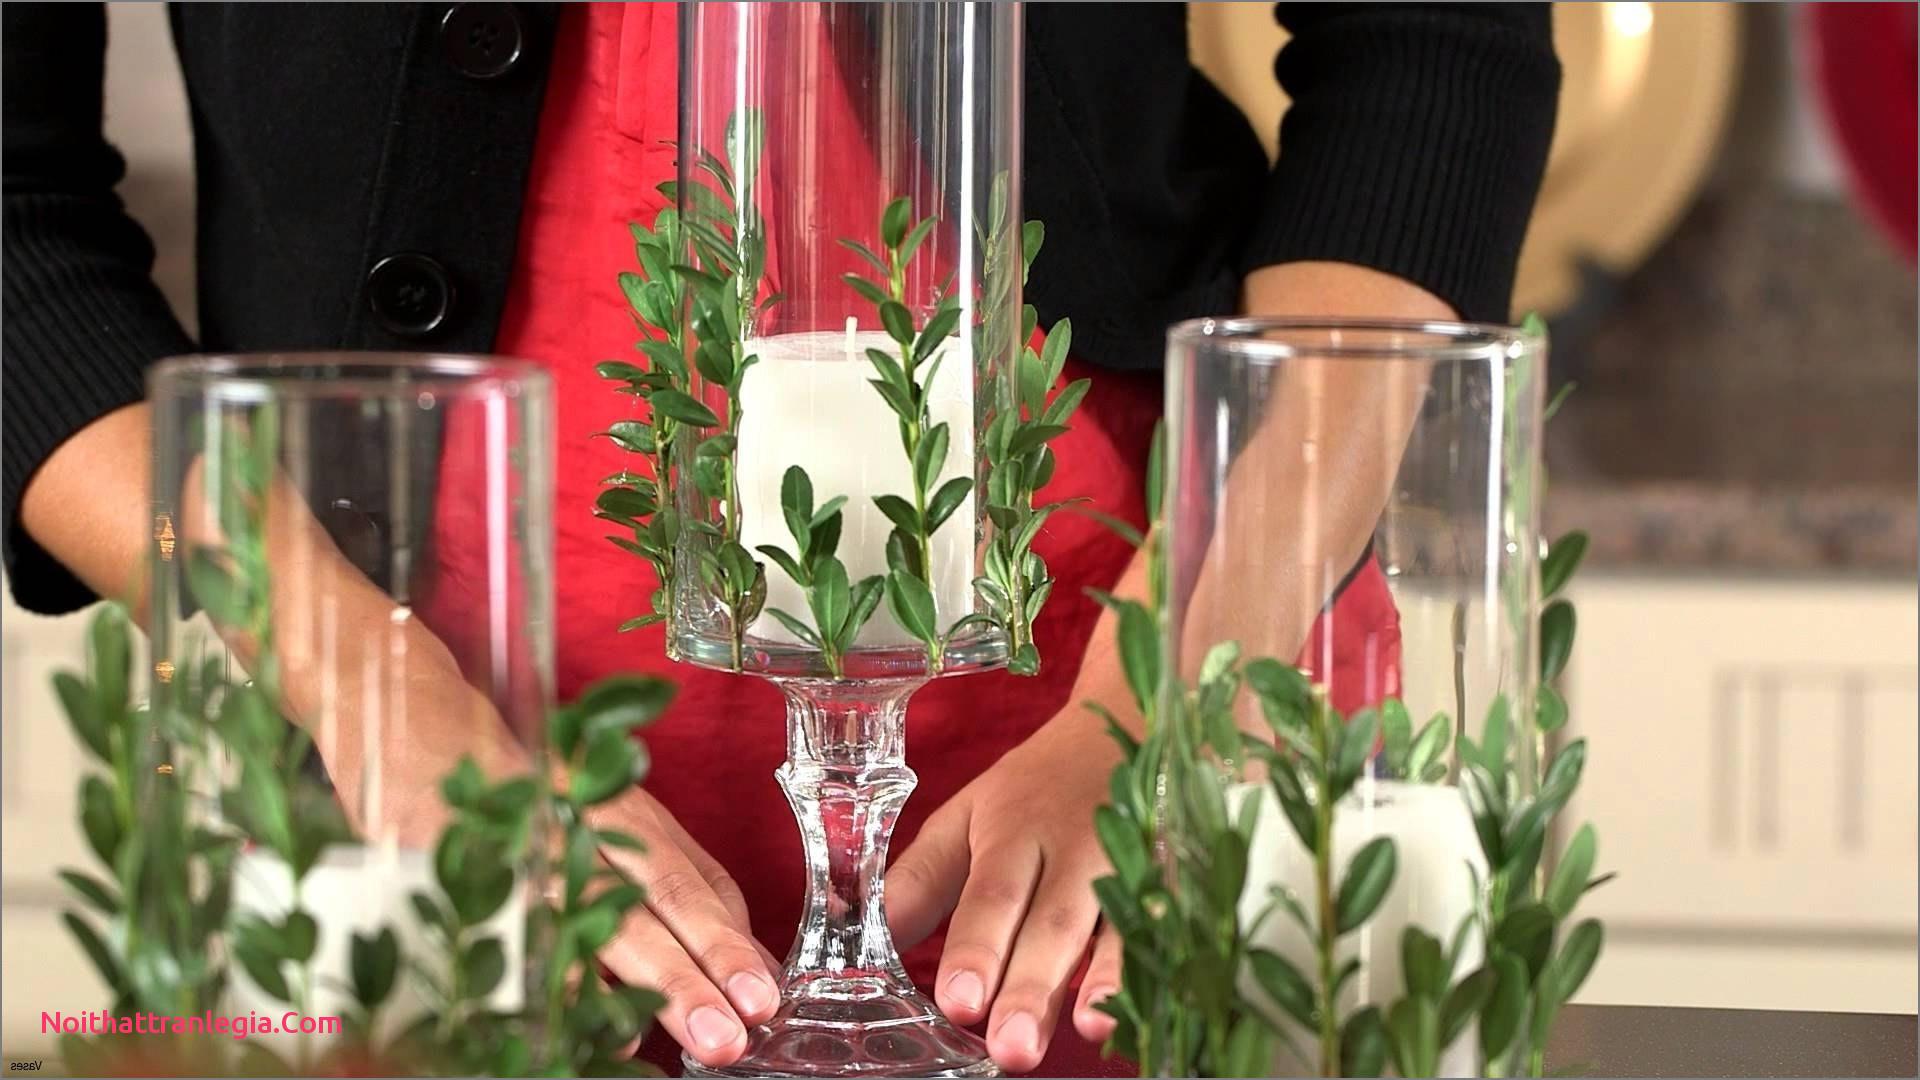 decorative crystal vases of 20 wedding vases noithattranlegia vases design pertaining to wedding centerpiece decoration ideas unique dollar tree wedding decorations awesome h vases dollar vase i 0d